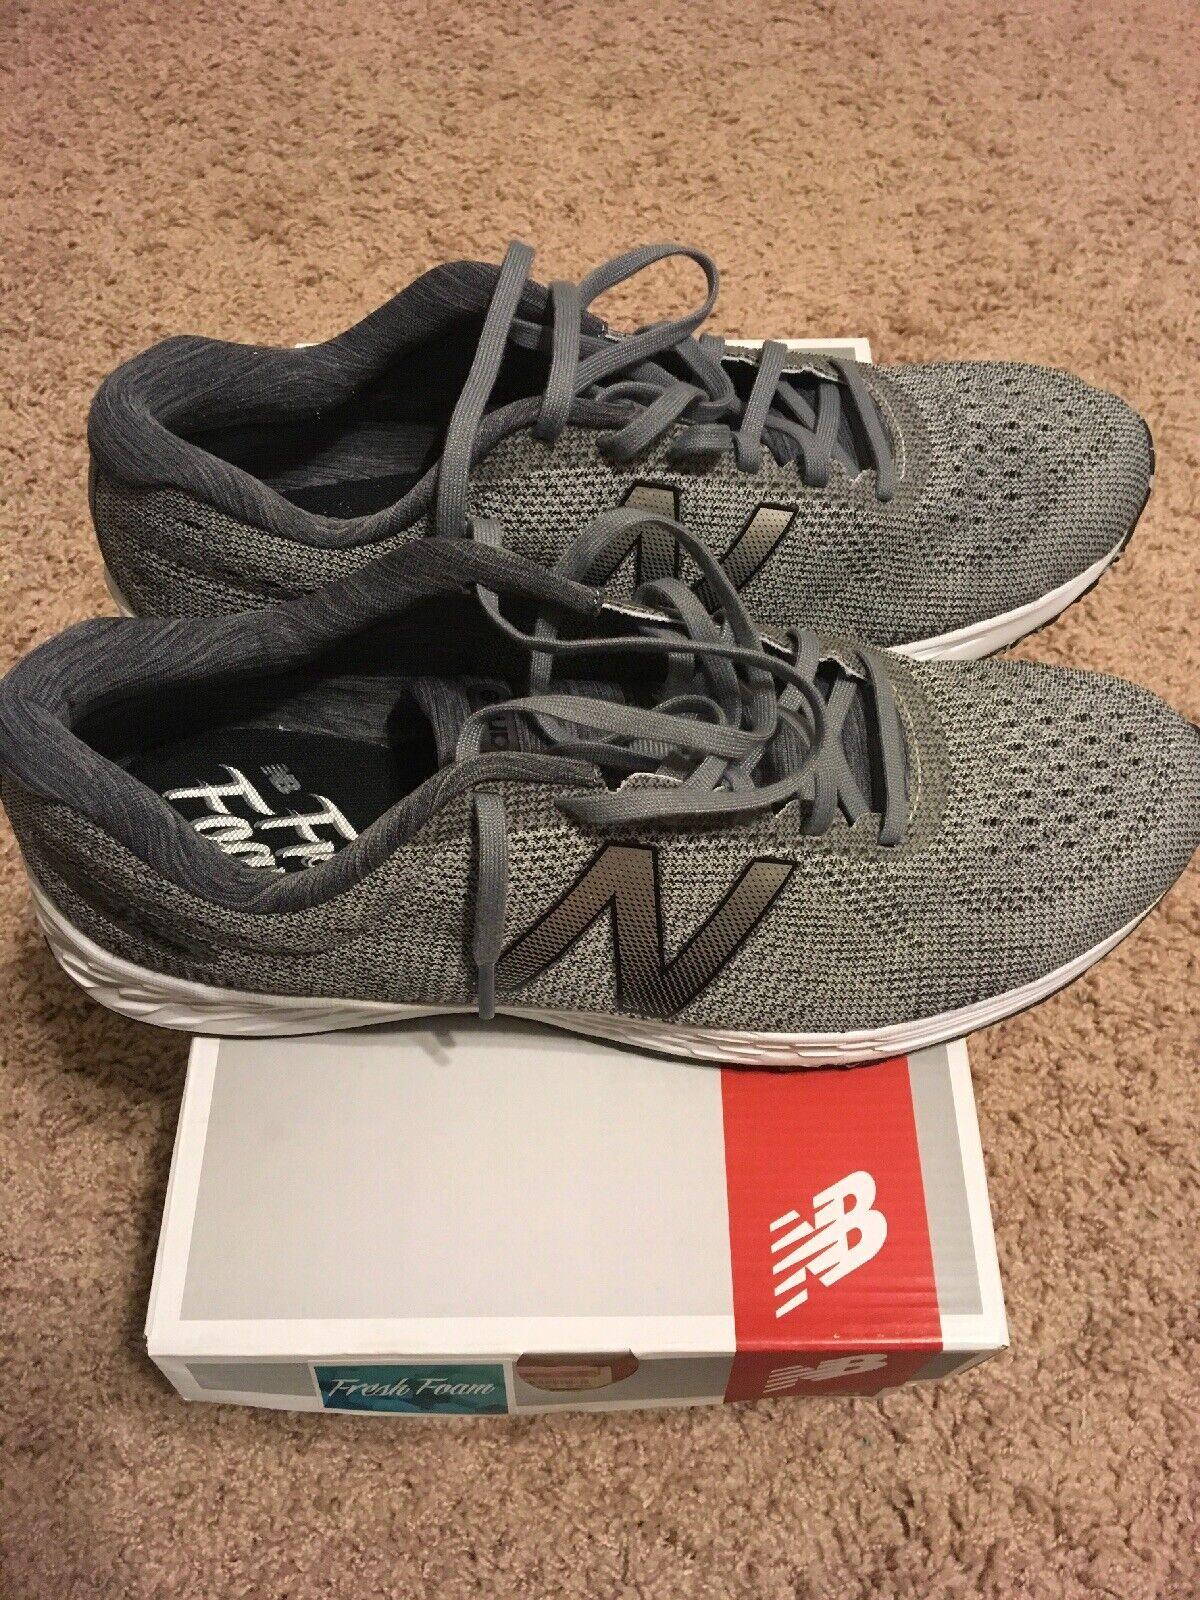 New Balance MARISRS1 Grey Mens Size 11 D Running shoes Sneakers Fresh Foam NIB